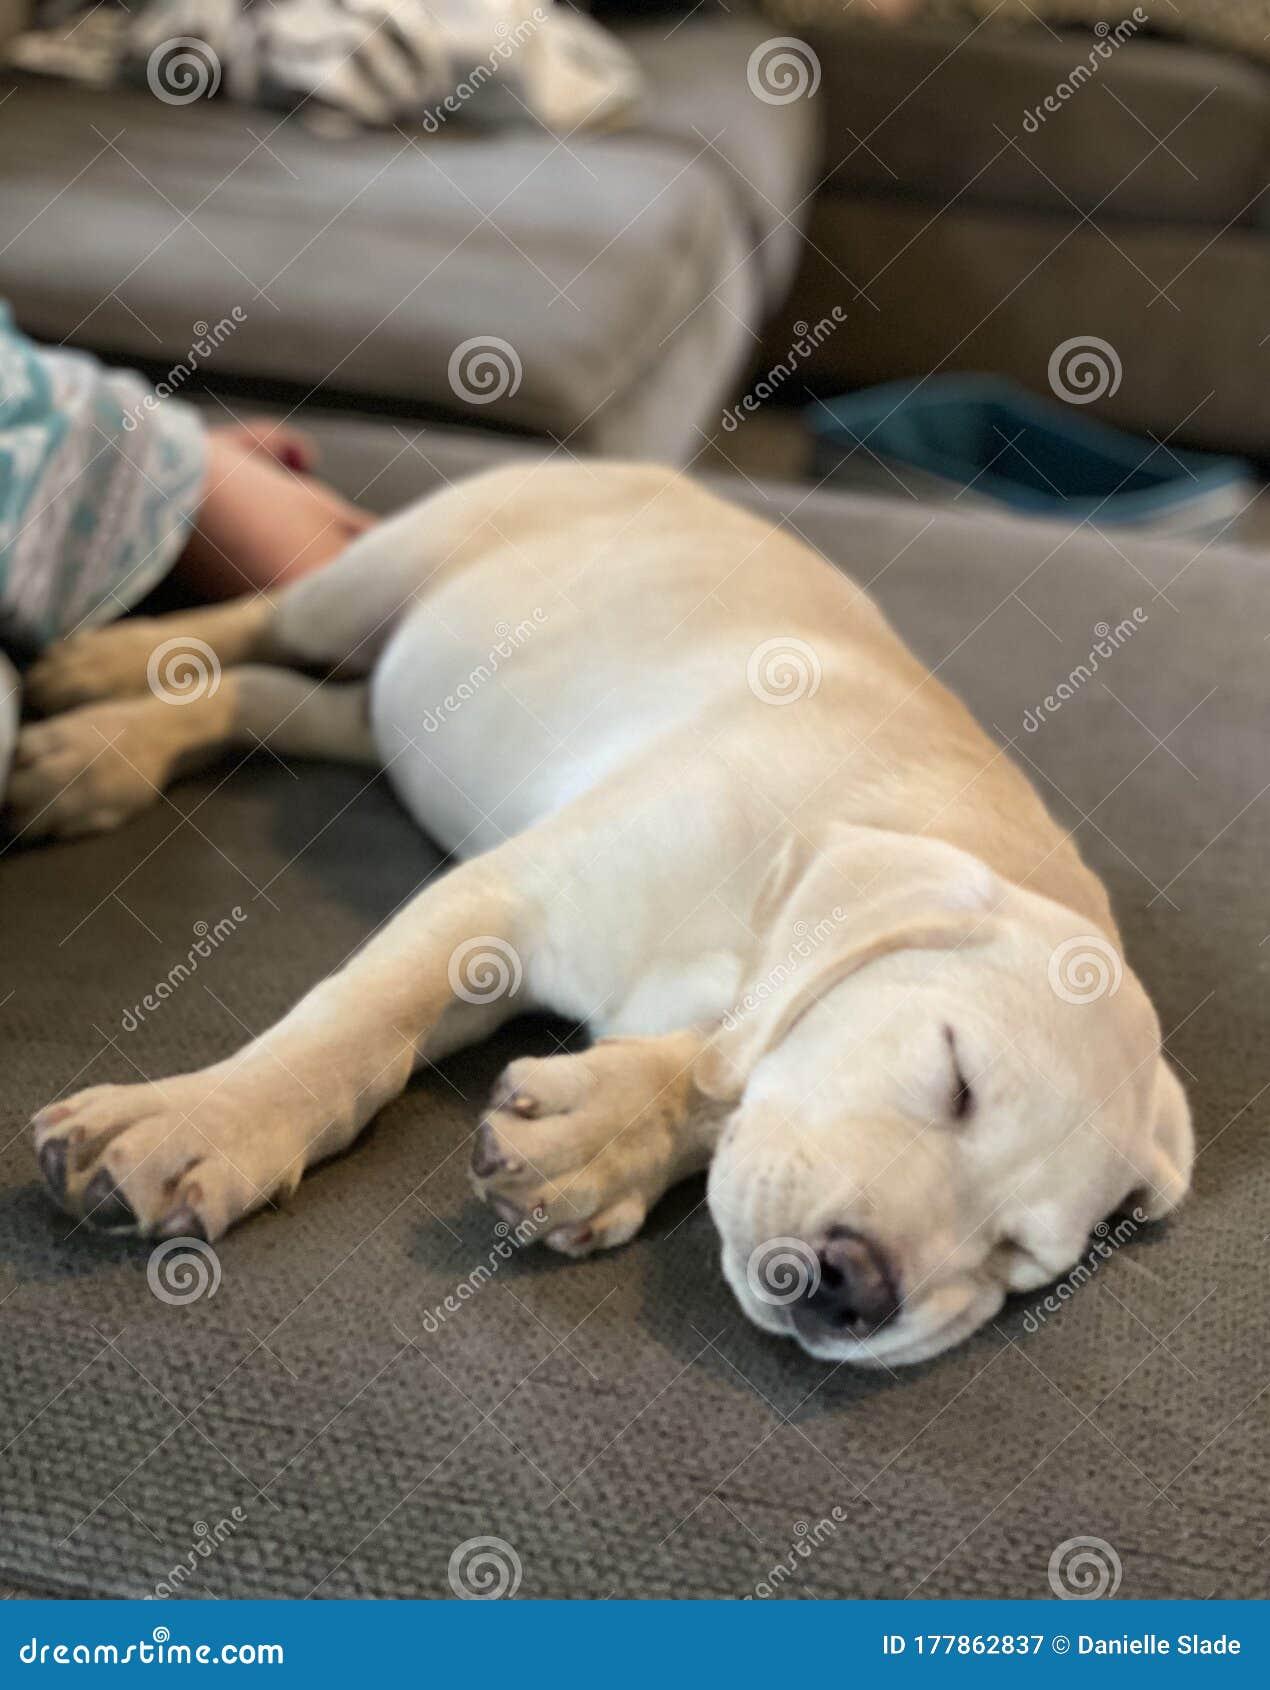 Yellow Labrador Retriever Puppy Stock Image Image Of Labrador Puppy 177862837